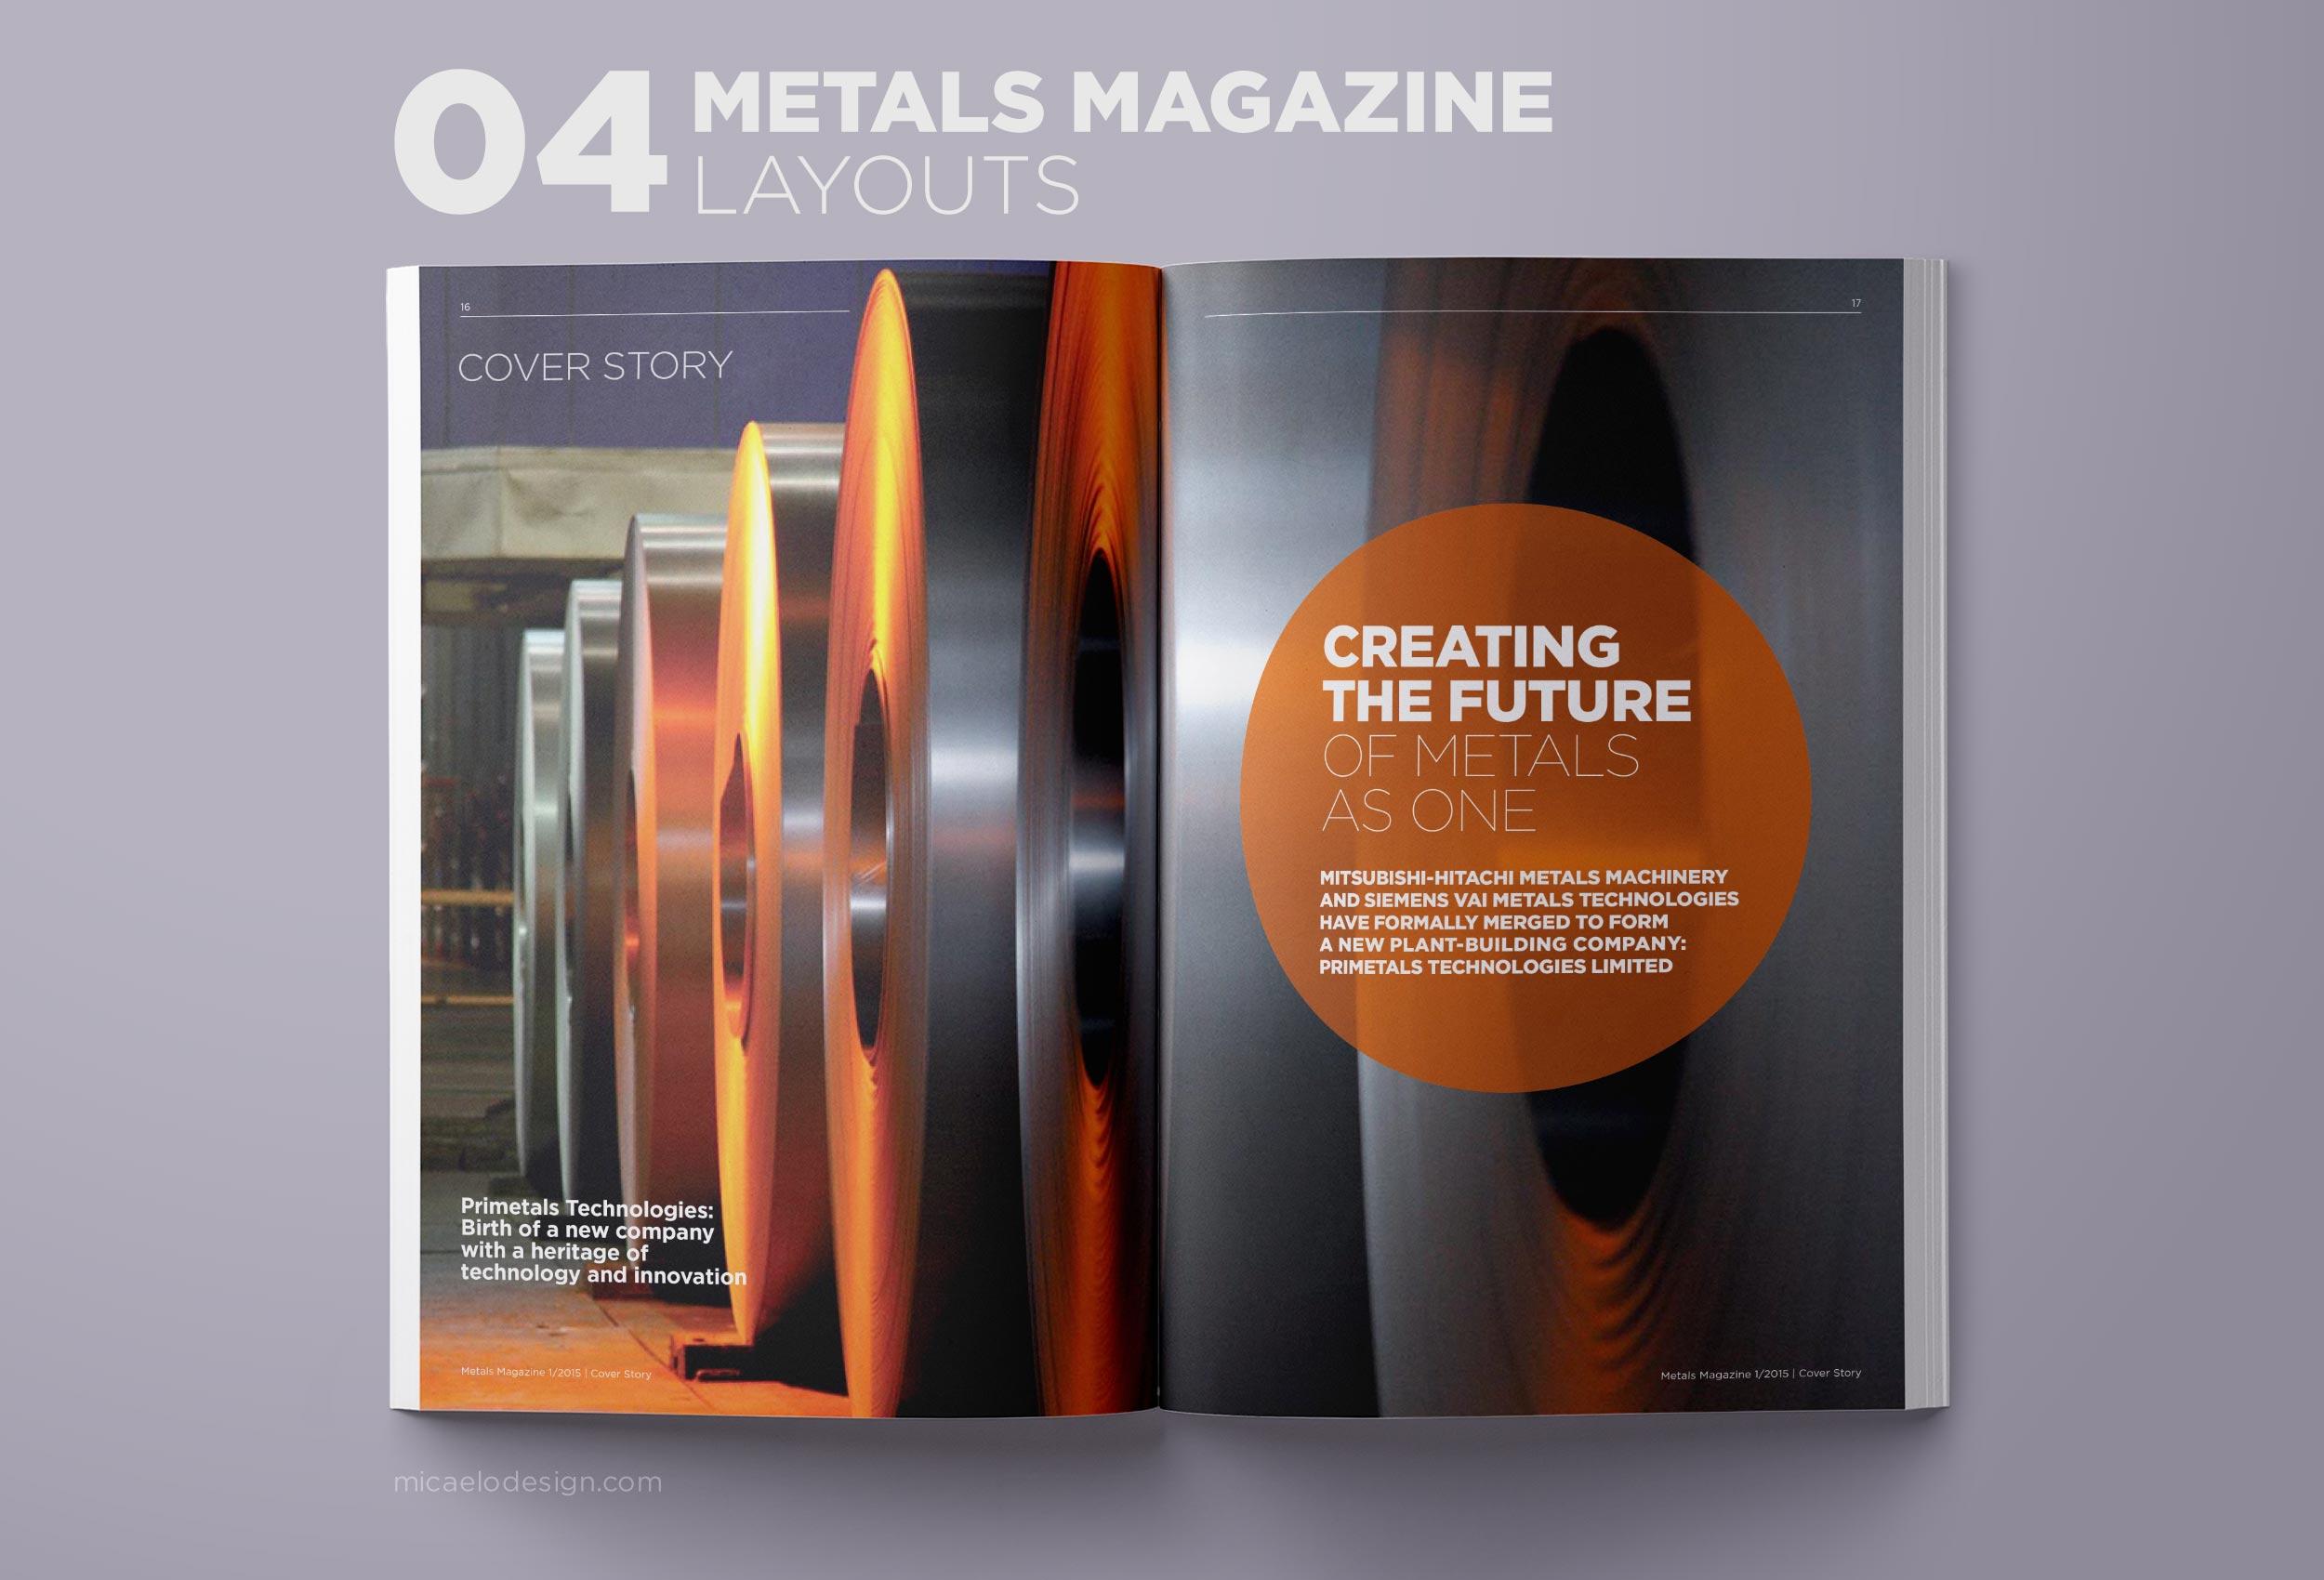 Primetals Metals Magazine layout N04